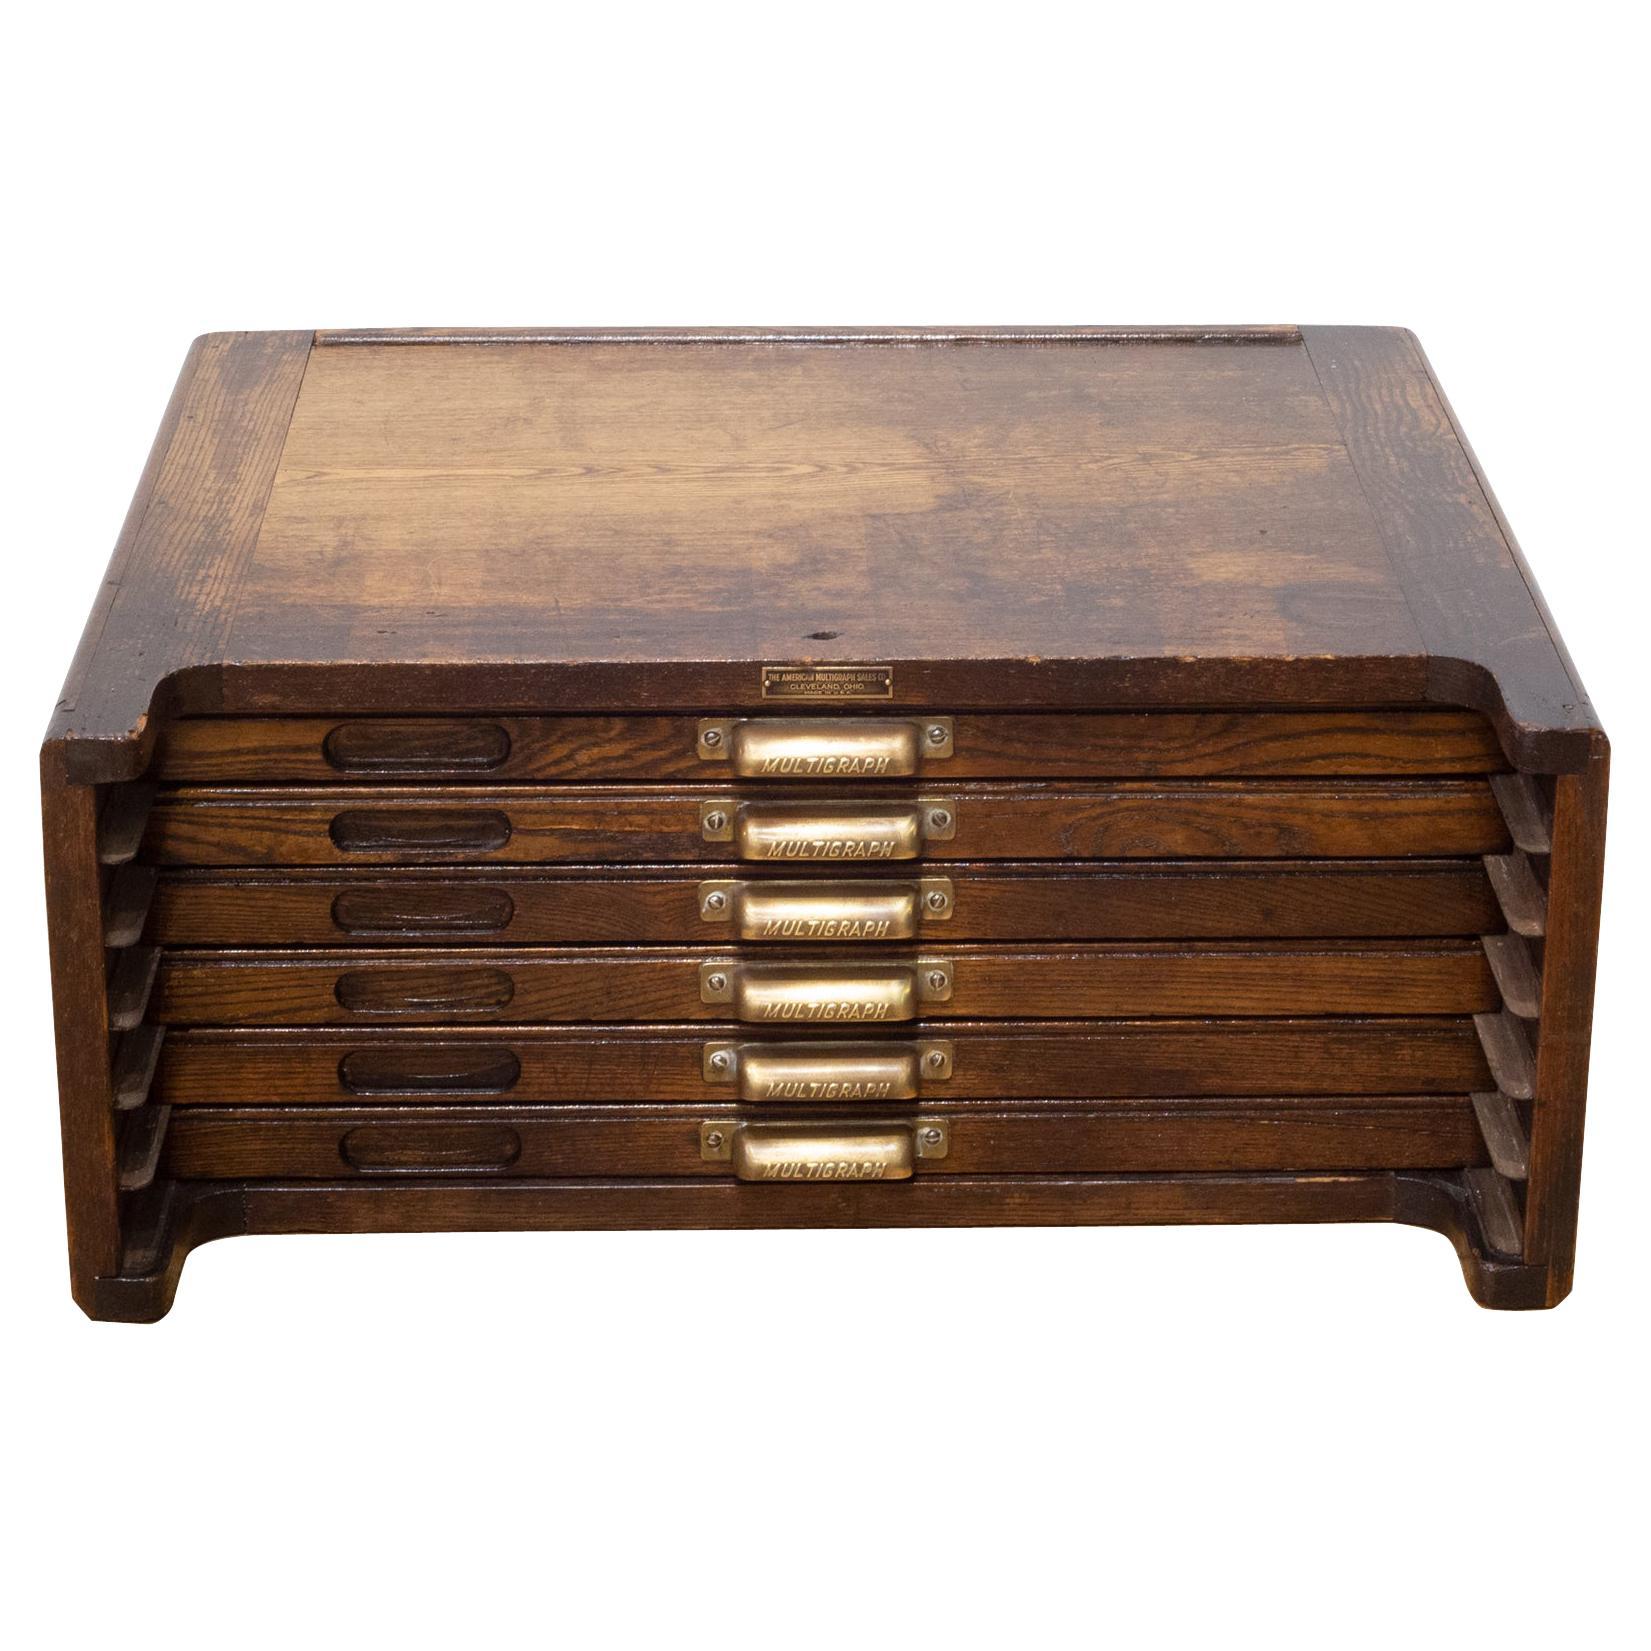 American Multigraph Sales Co. Printer's Typeset Cabinet, c.1920-1930